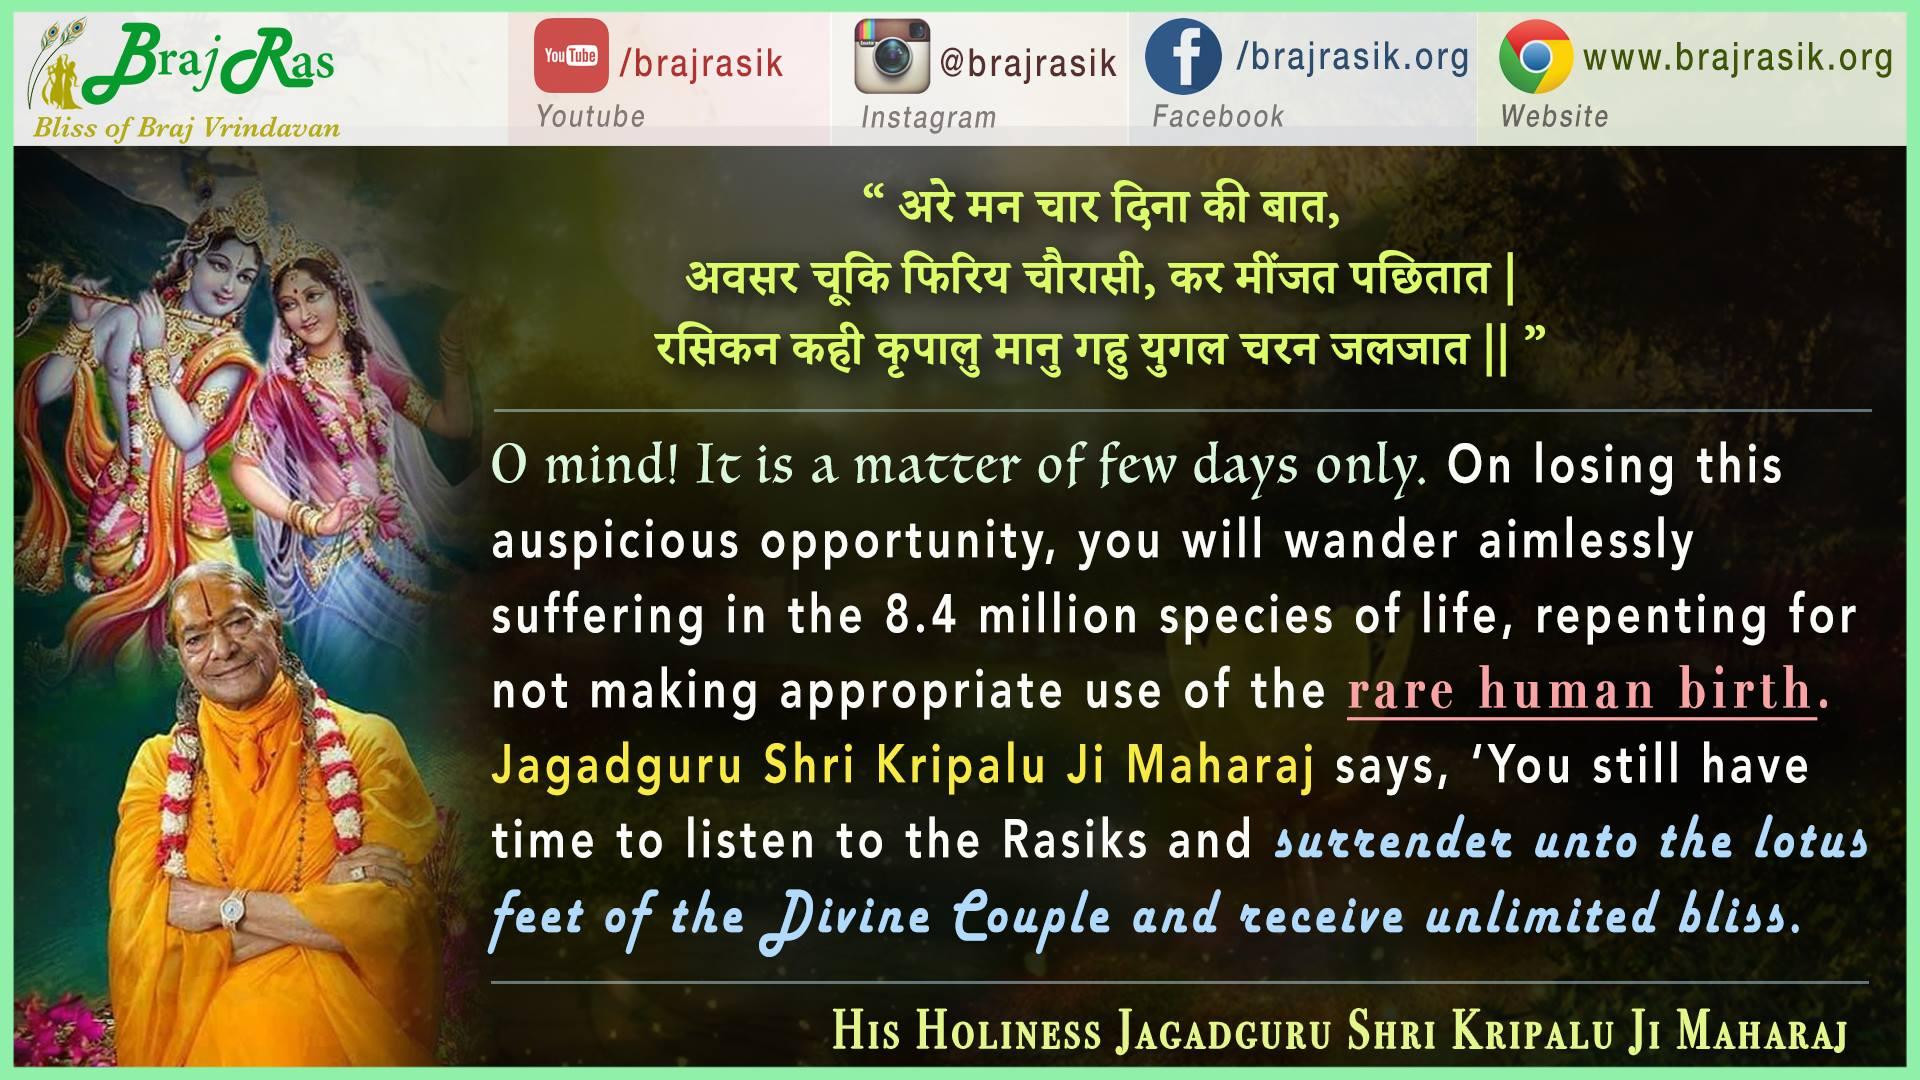 Are Man Chaar Dina Kee Baat - His Holiness Jagadguru Shri Kripalu Ji Maharaj